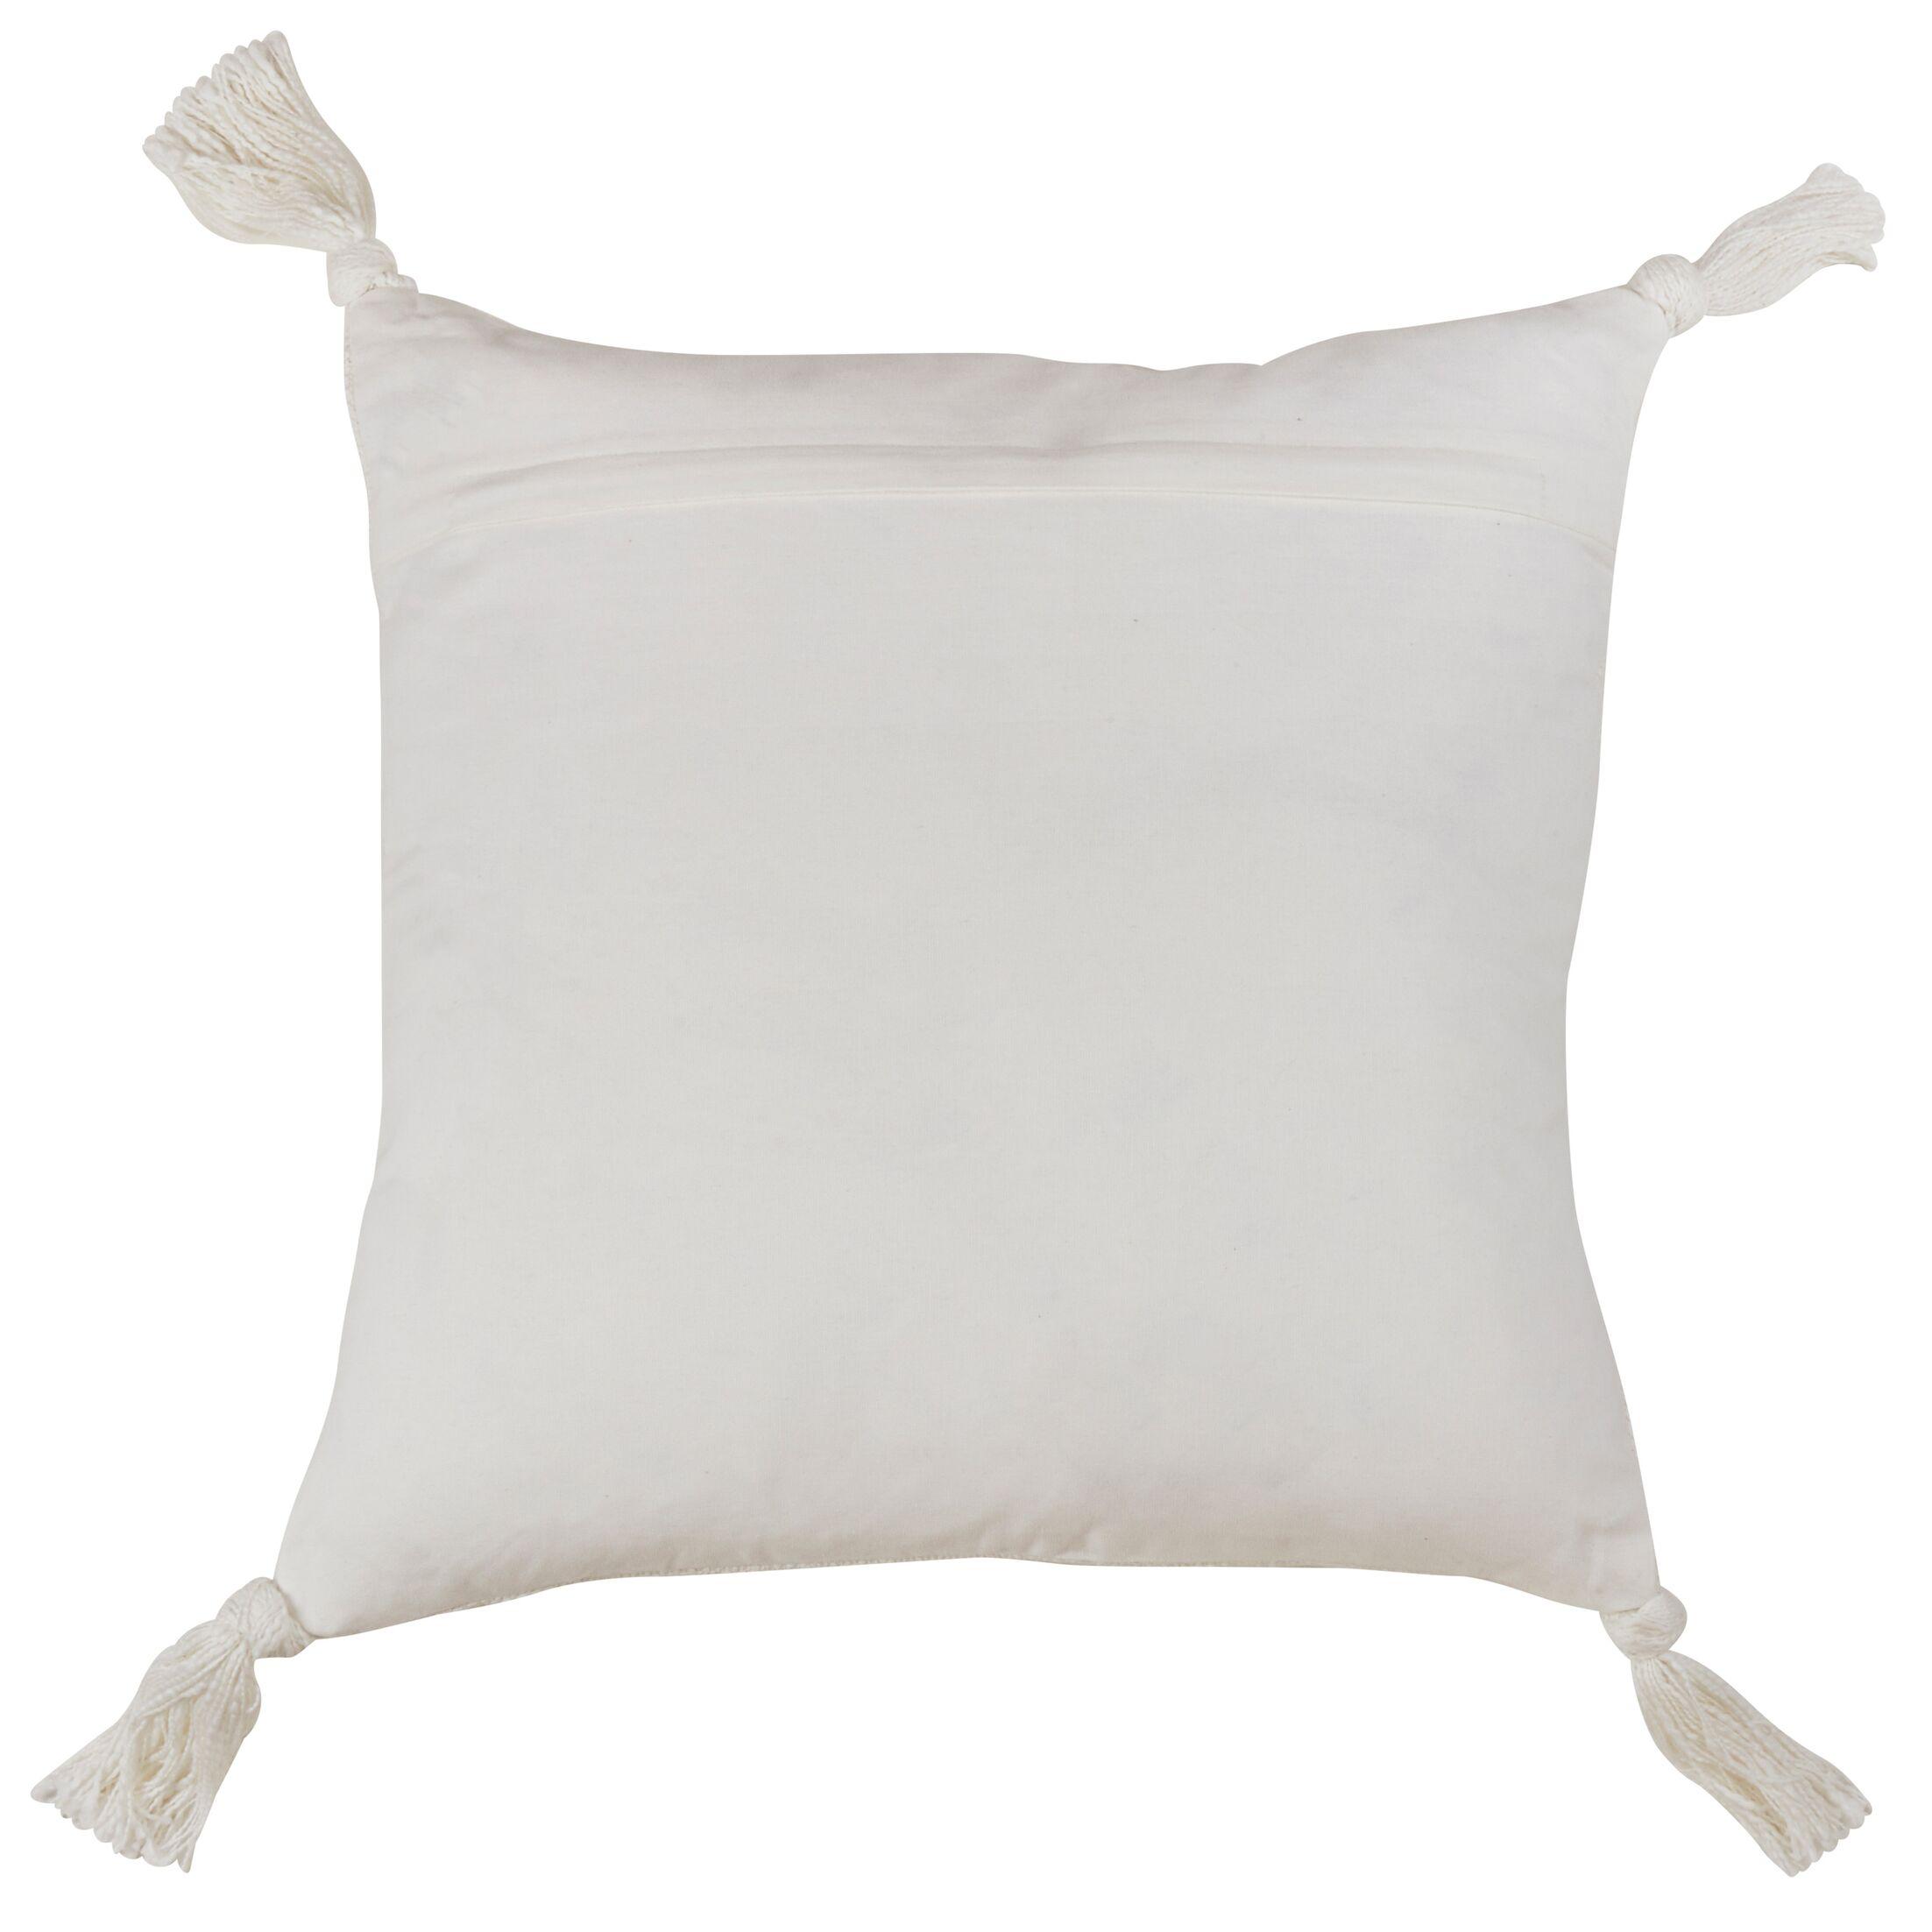 Zemple Tasseled Design Cotton Throw Pillow Size: 20x20, Color: Natural